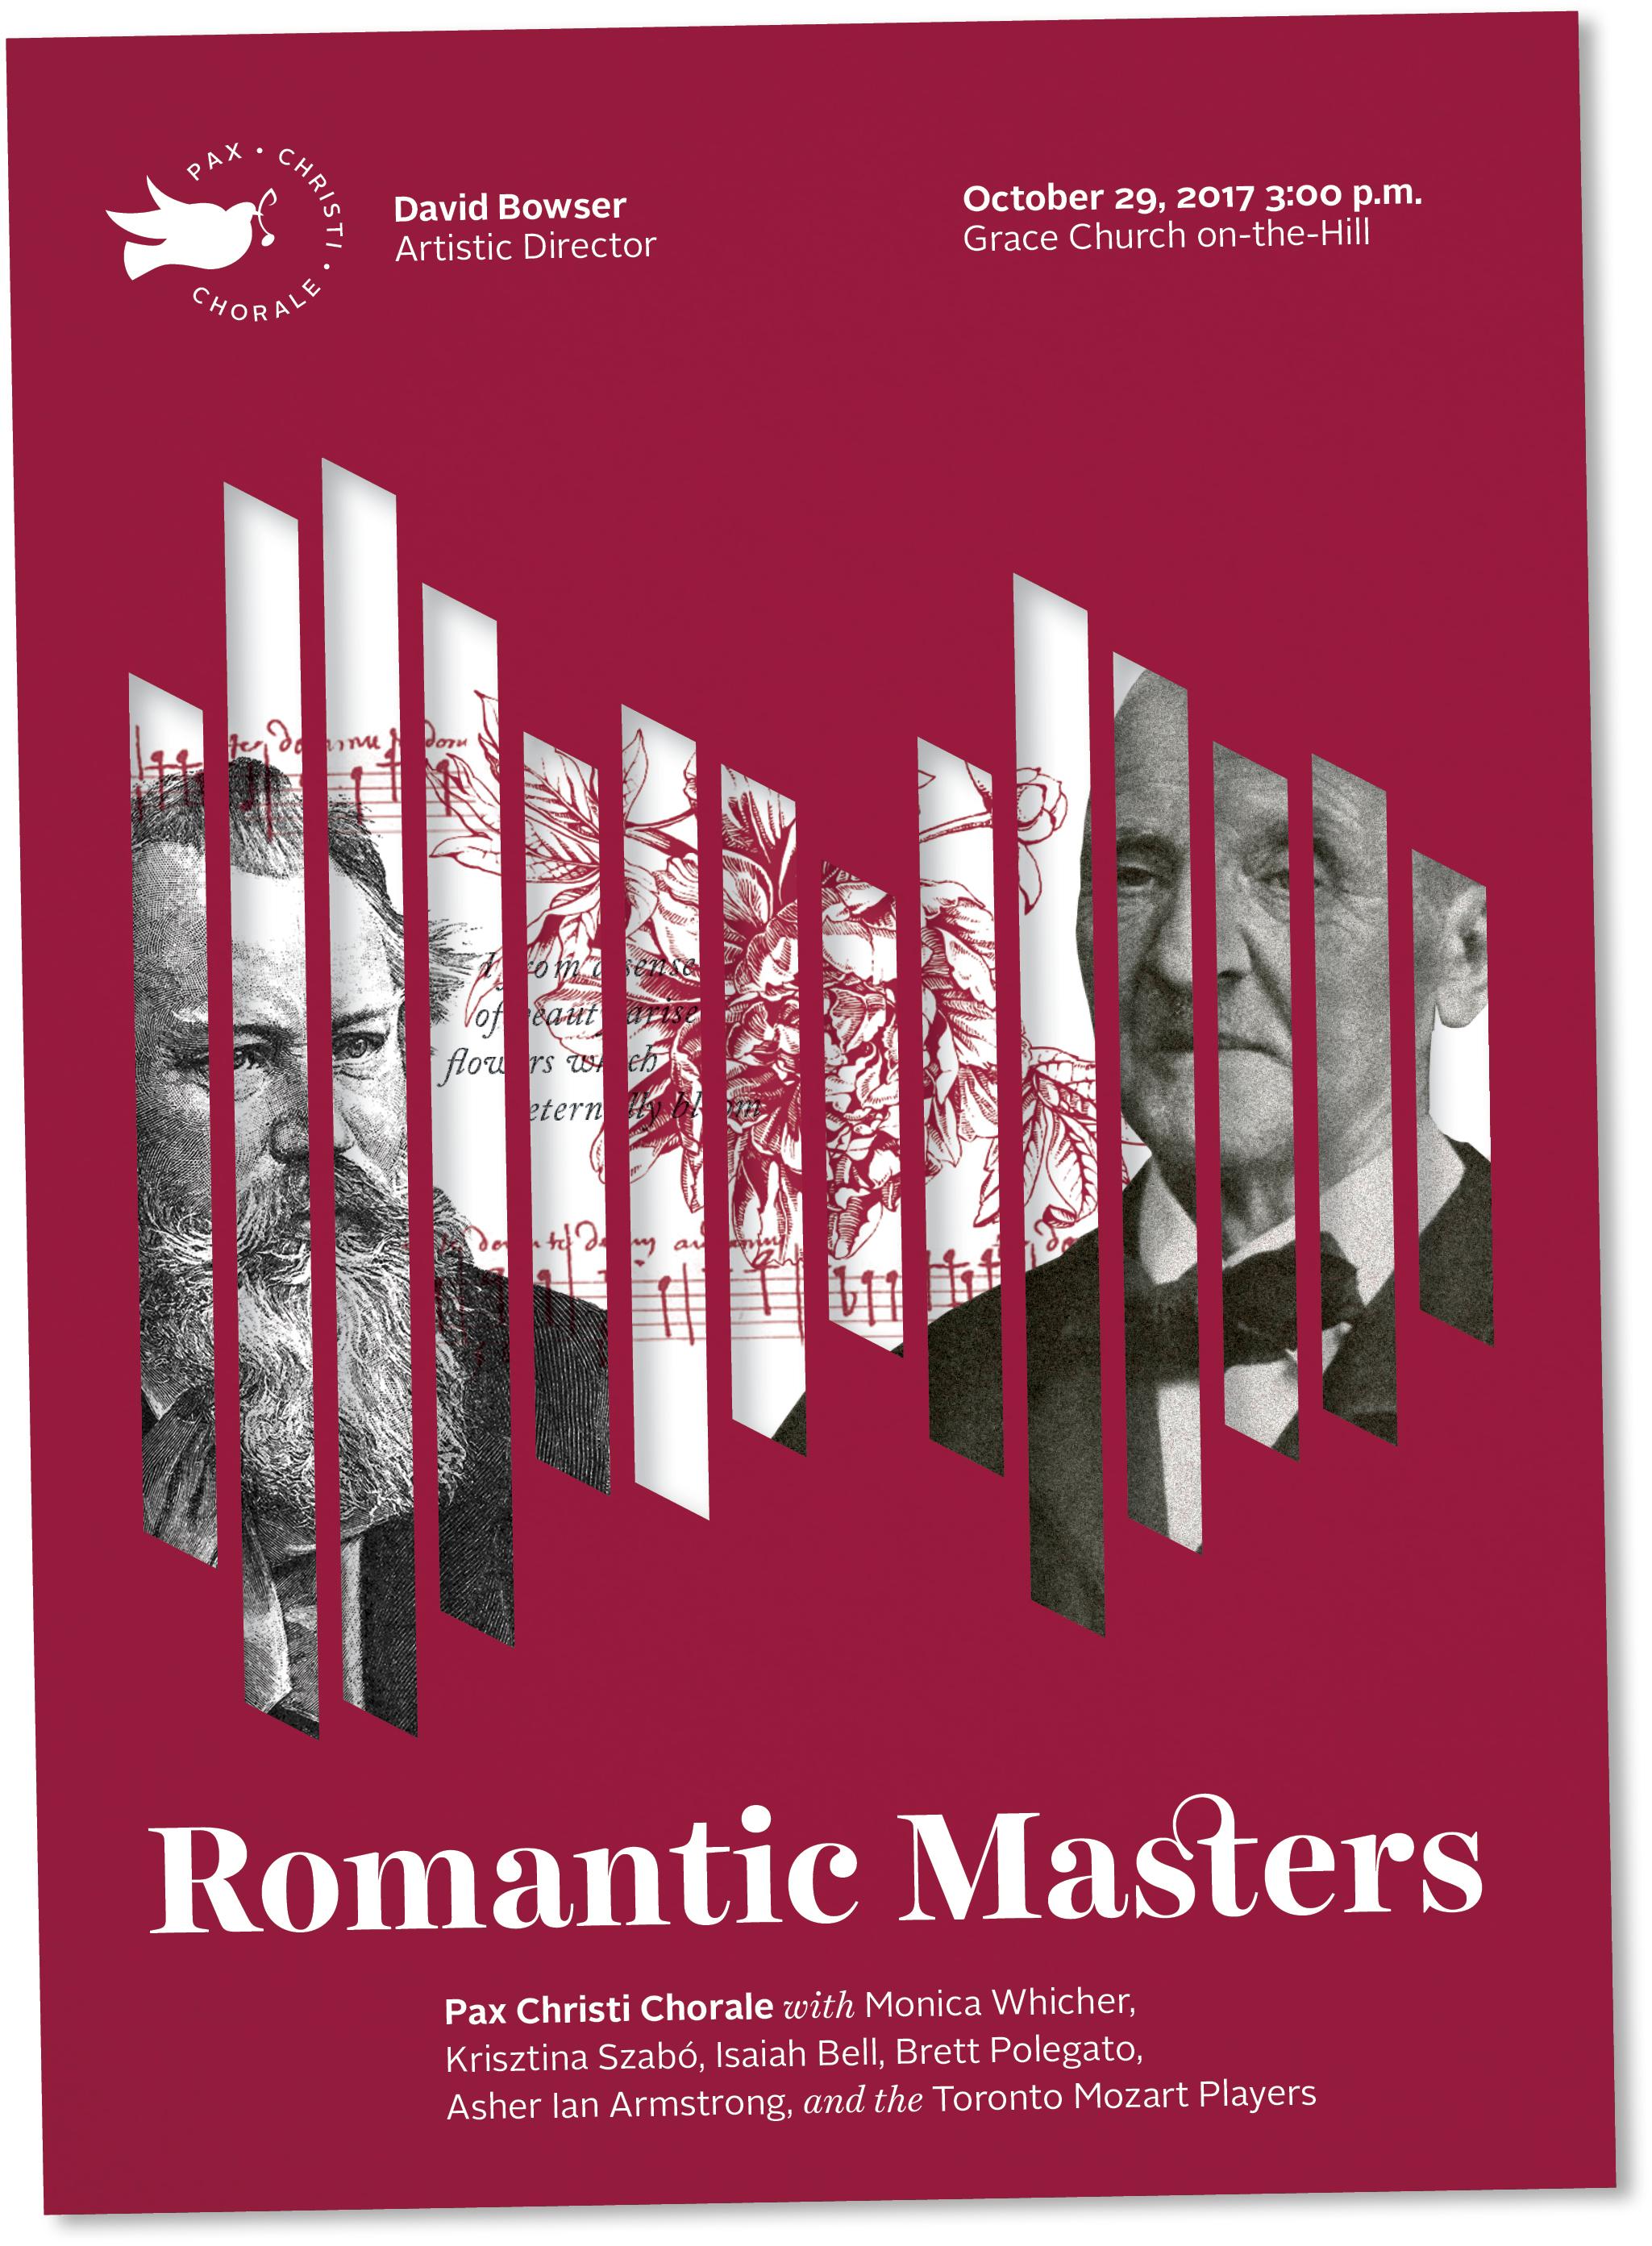 PaxChristi_choir_toronto_gracechurch_choral_music_performance_romancticmasters.jpg